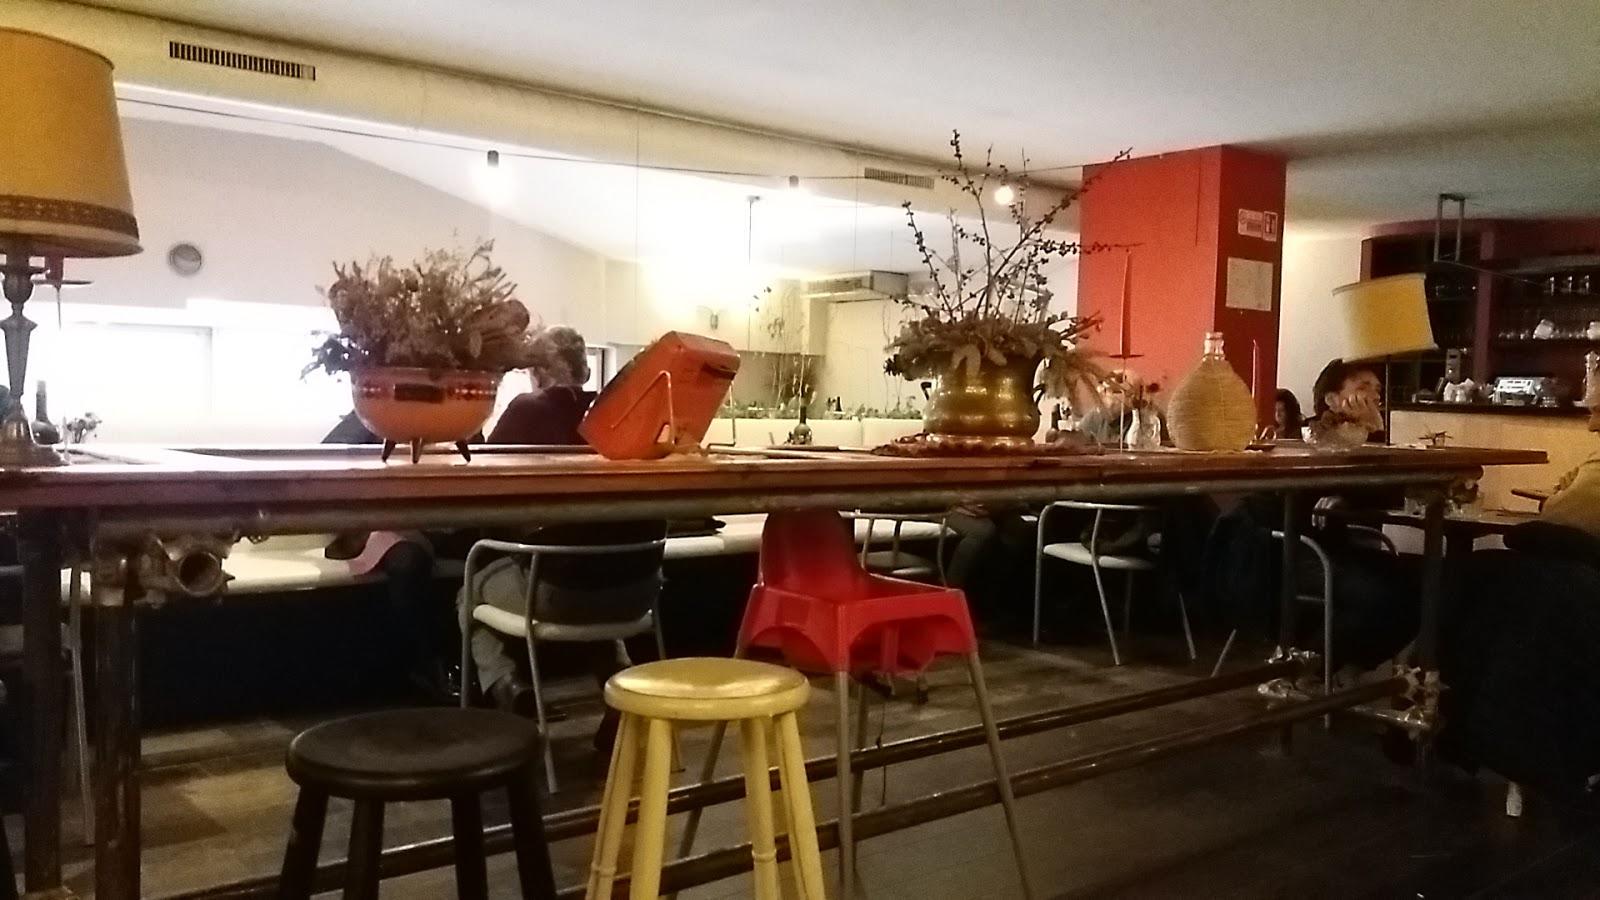 Bar Arredati Con Pallet mix bistrò • ioscelgoveg